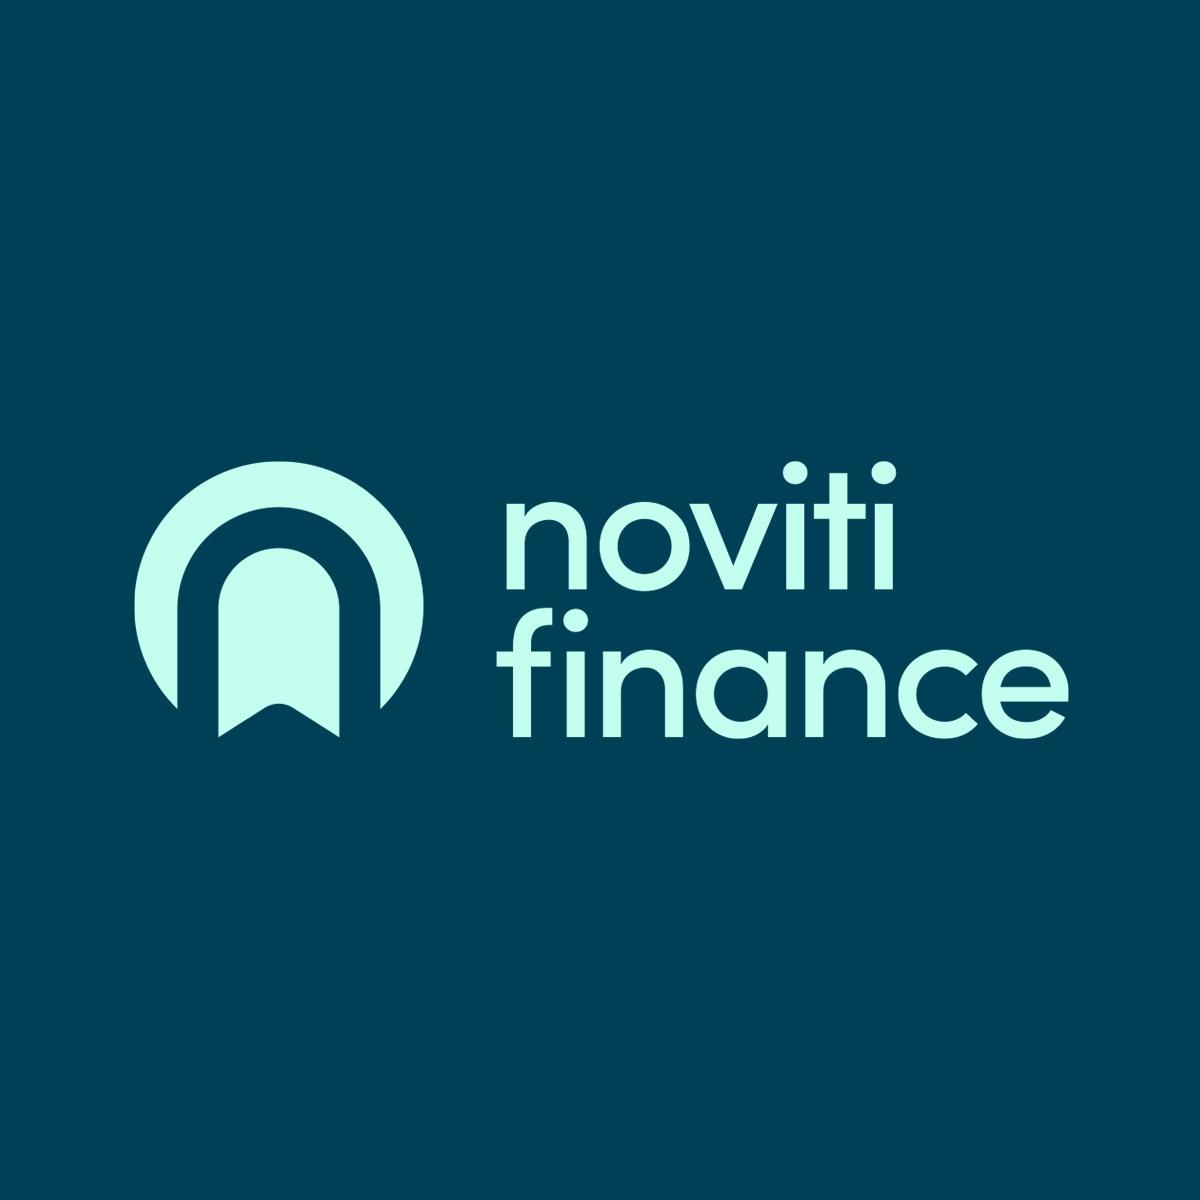 noviti finance verslo paskola